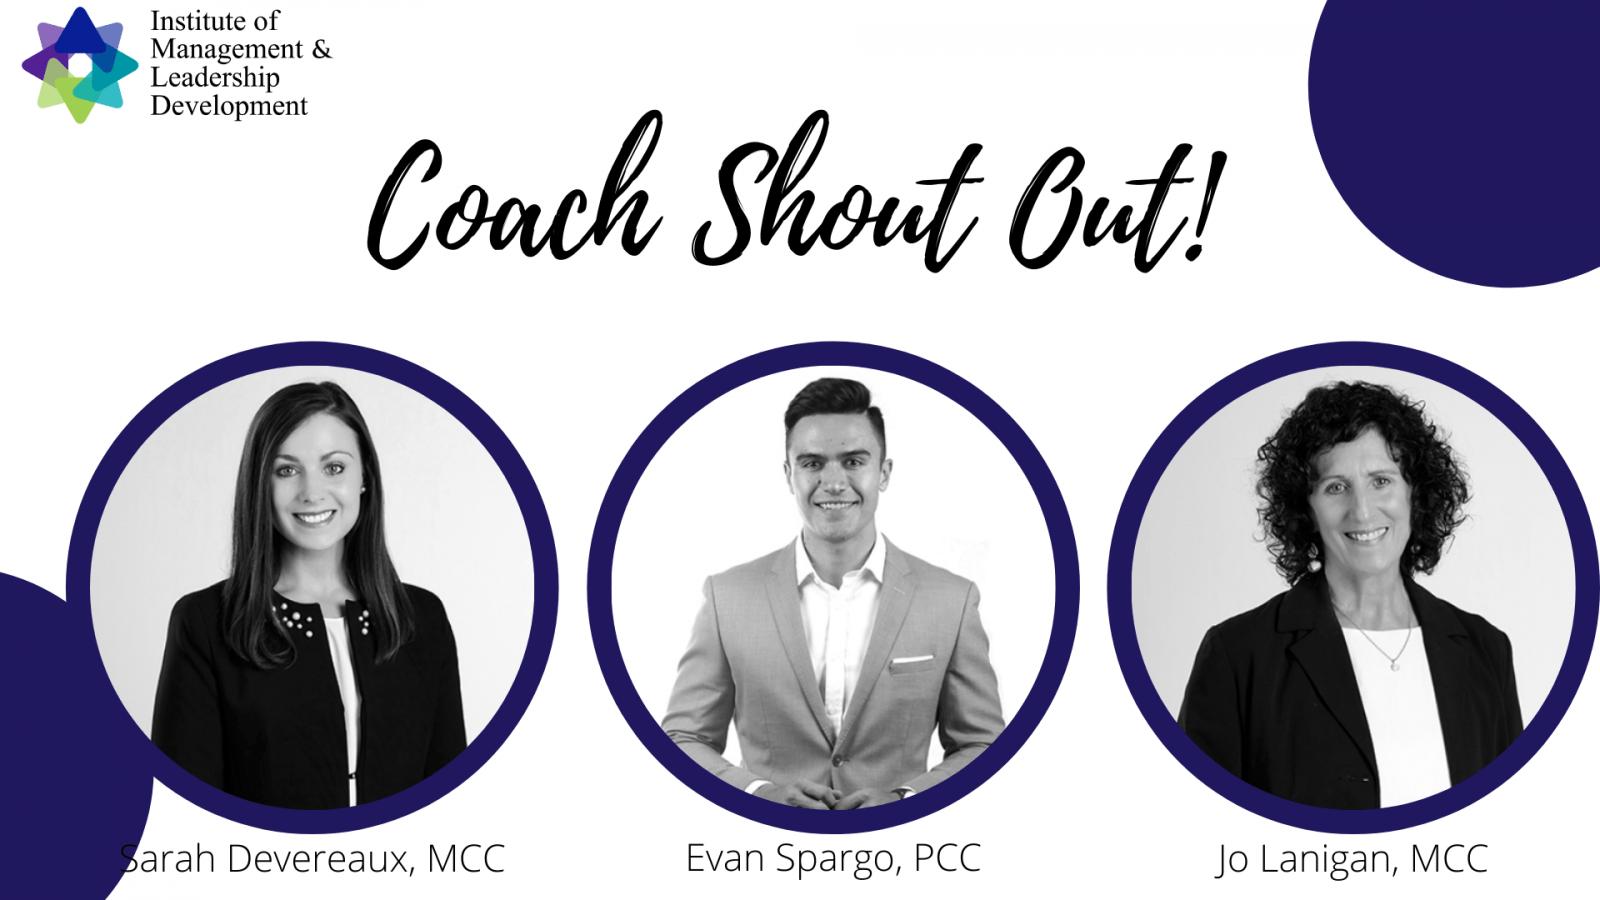 Executive Coach Shout Out